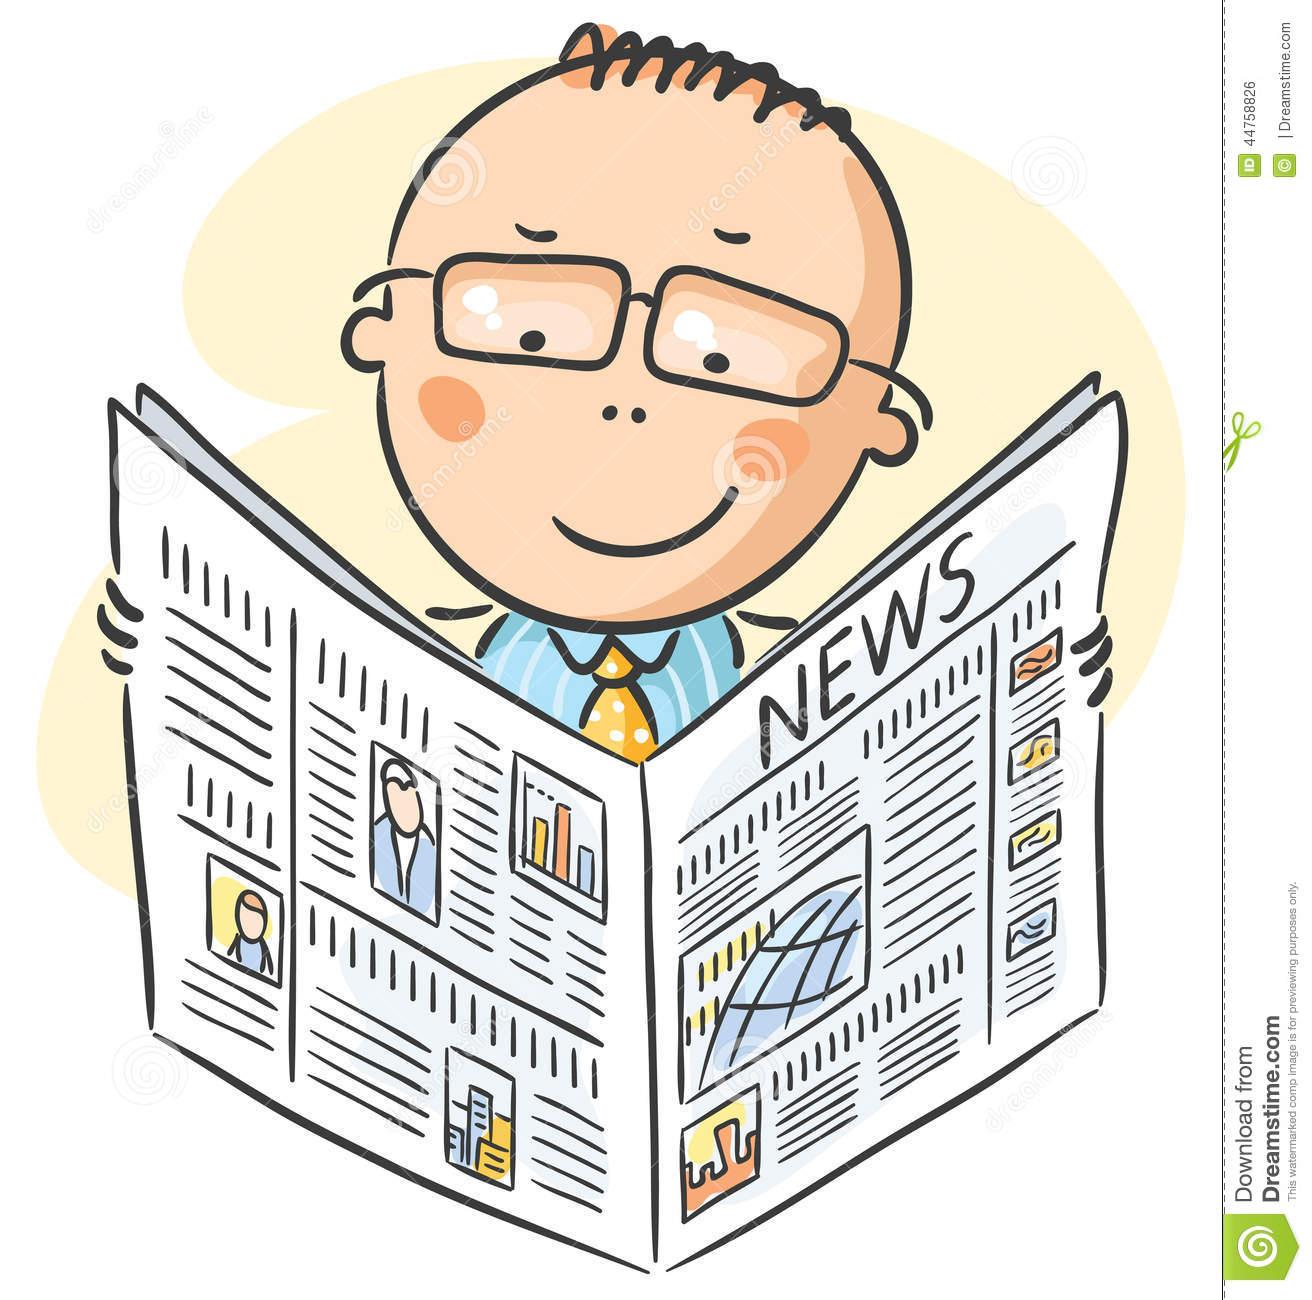 man-glasses-reading-newspaper-cartoon-44758826